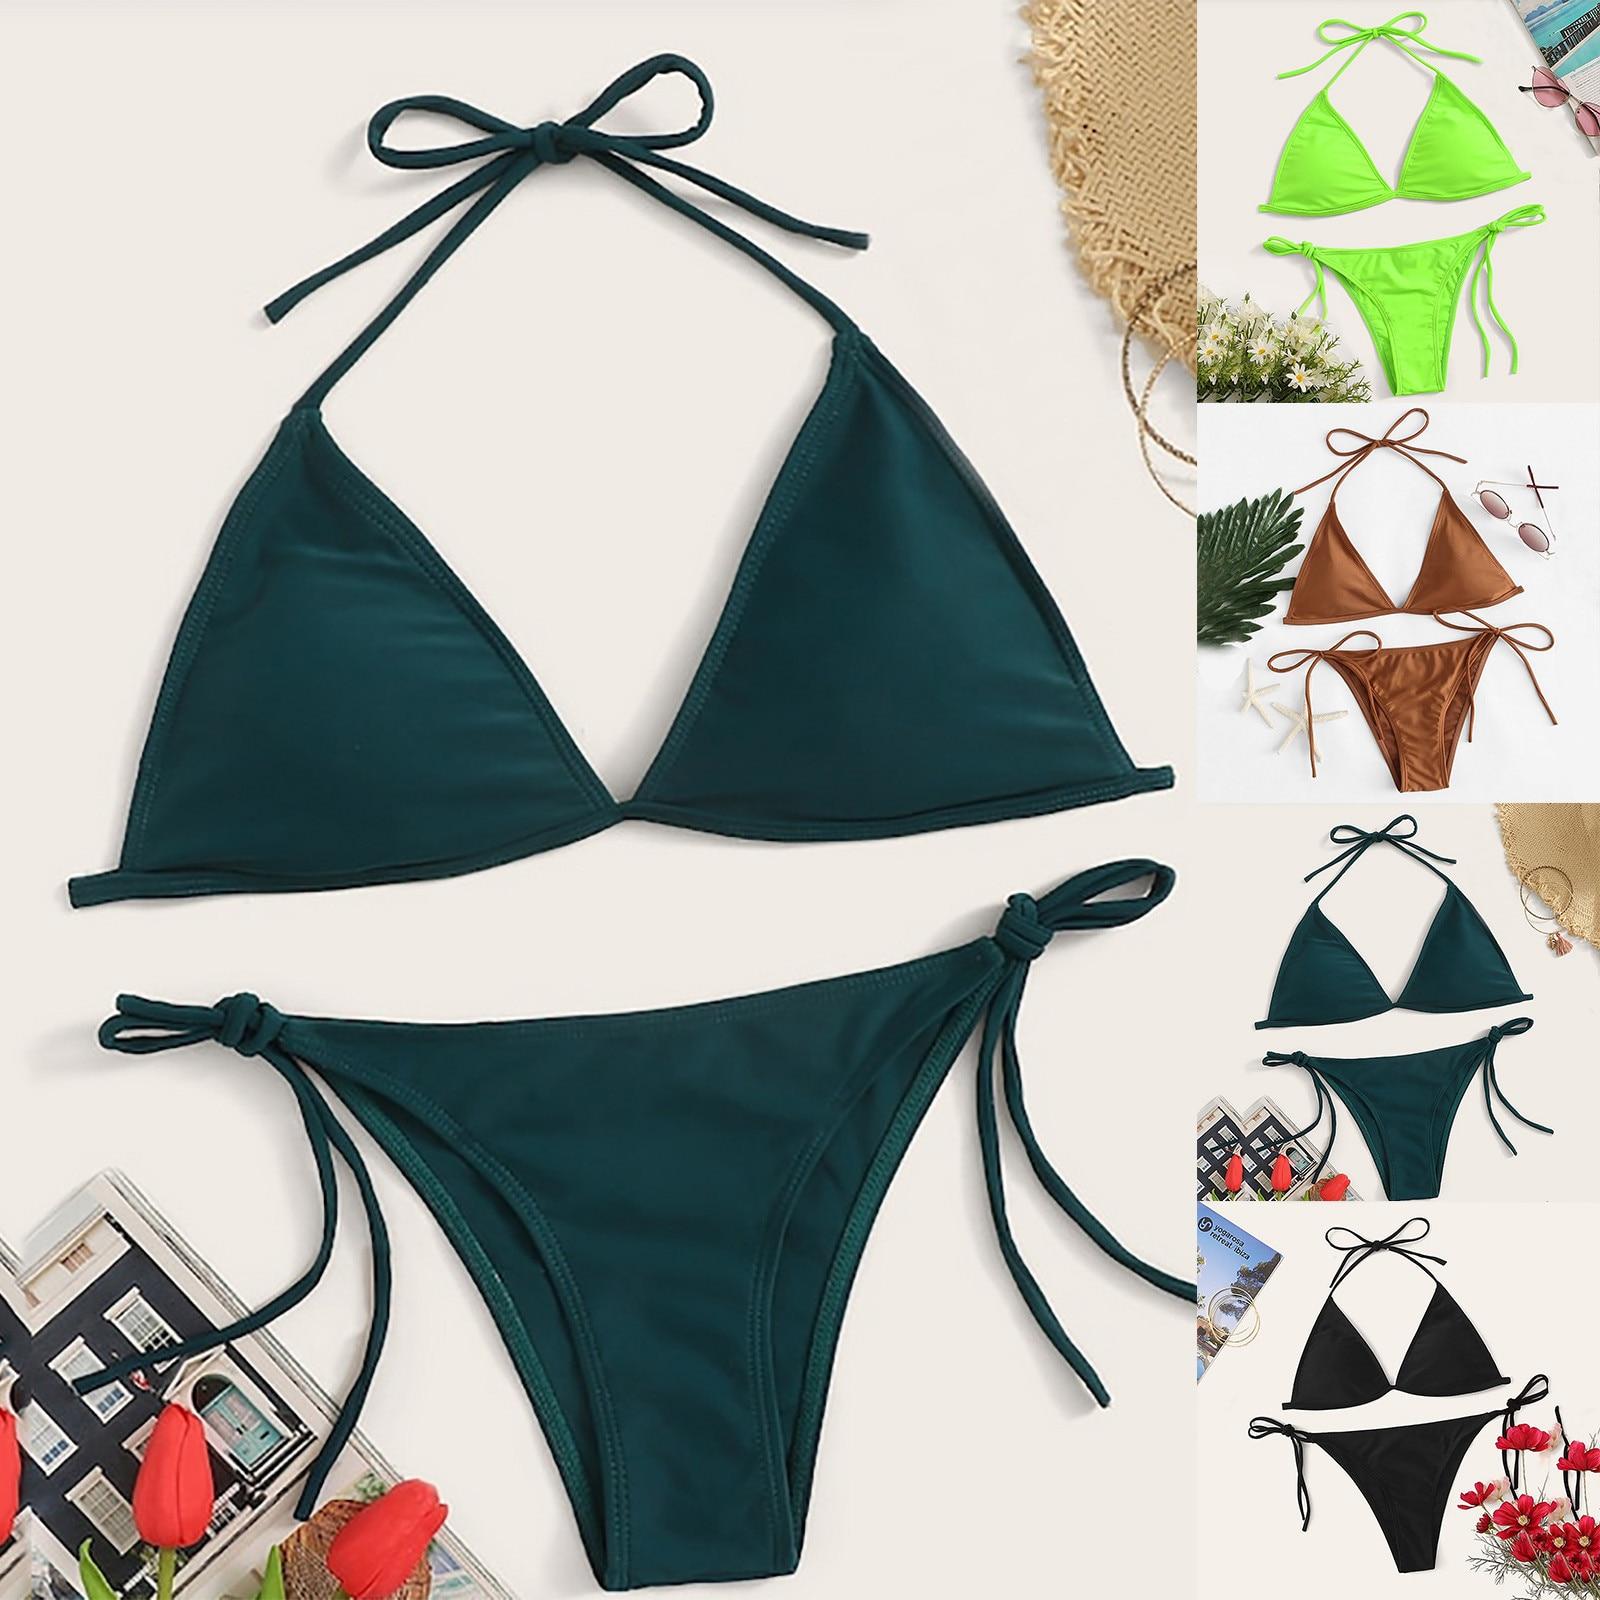 Ladies Sexy Solid Color Split Bikini Swimsuit 2021 Female Swimsuit Women Swimwear Two-piece Bathing Suit Swim Black Khaki Green